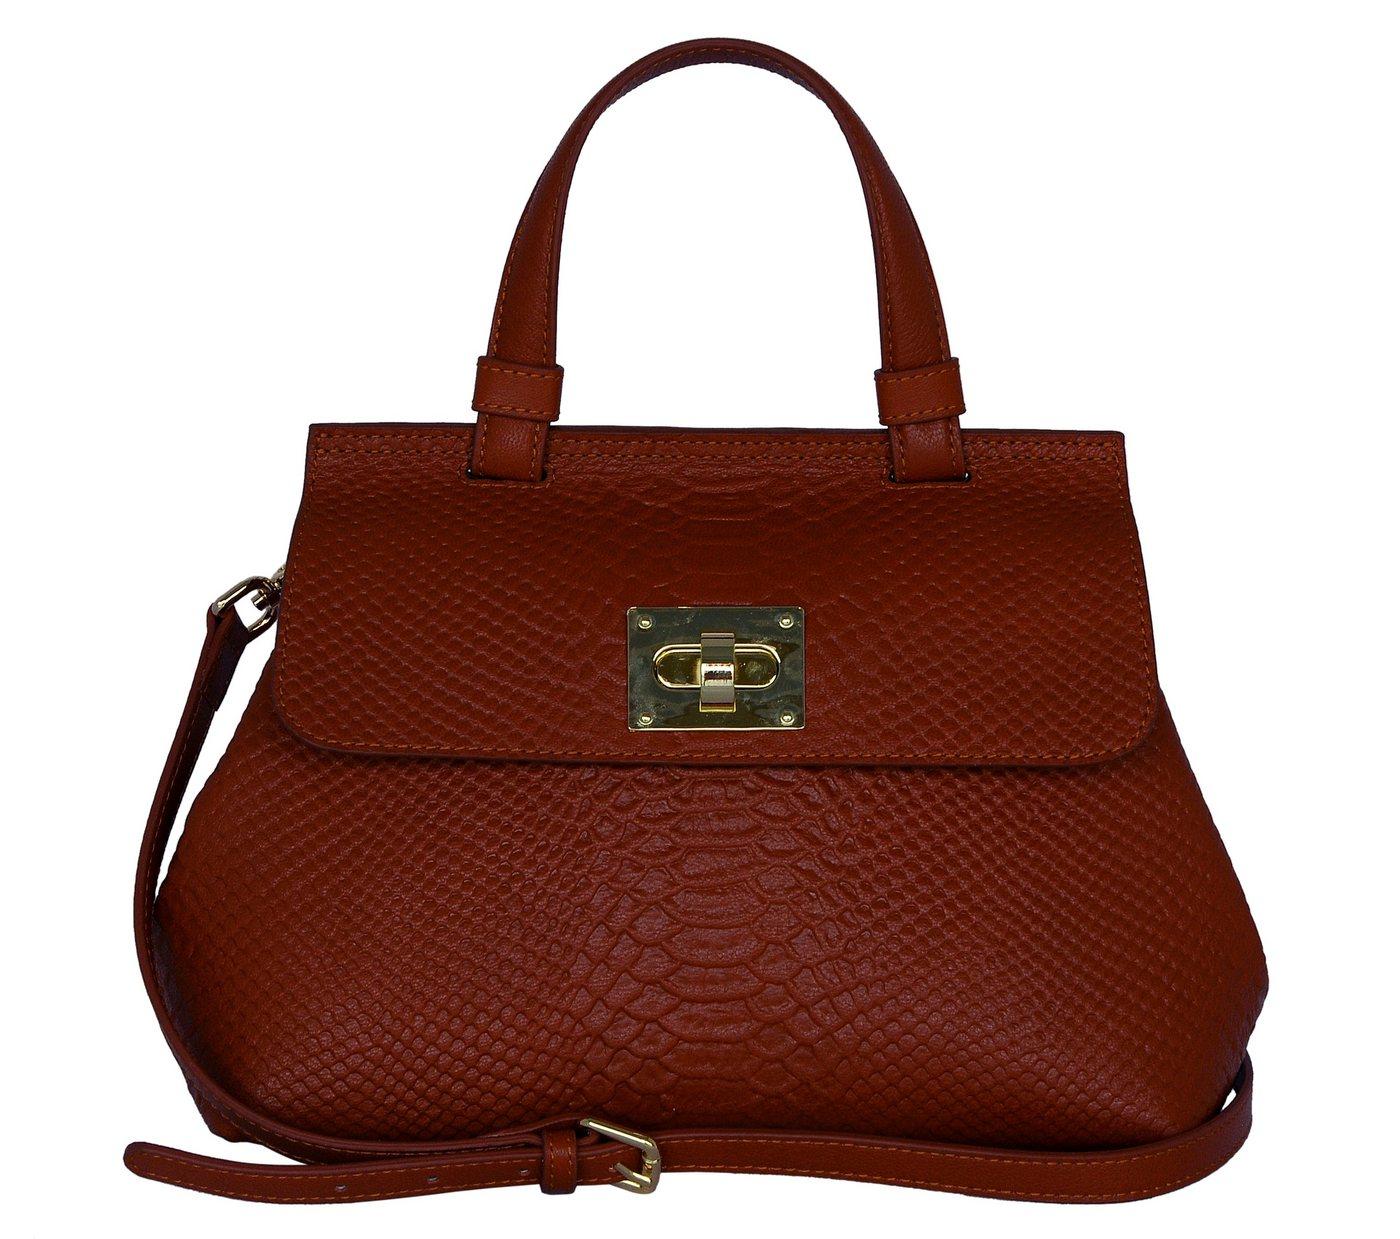 Silvio Tossi Lederhandtasche mit Anakonda-Prägung | Taschen > Handtaschen > Ledertaschen | Rot | Baumwolle | Silvio Tossi